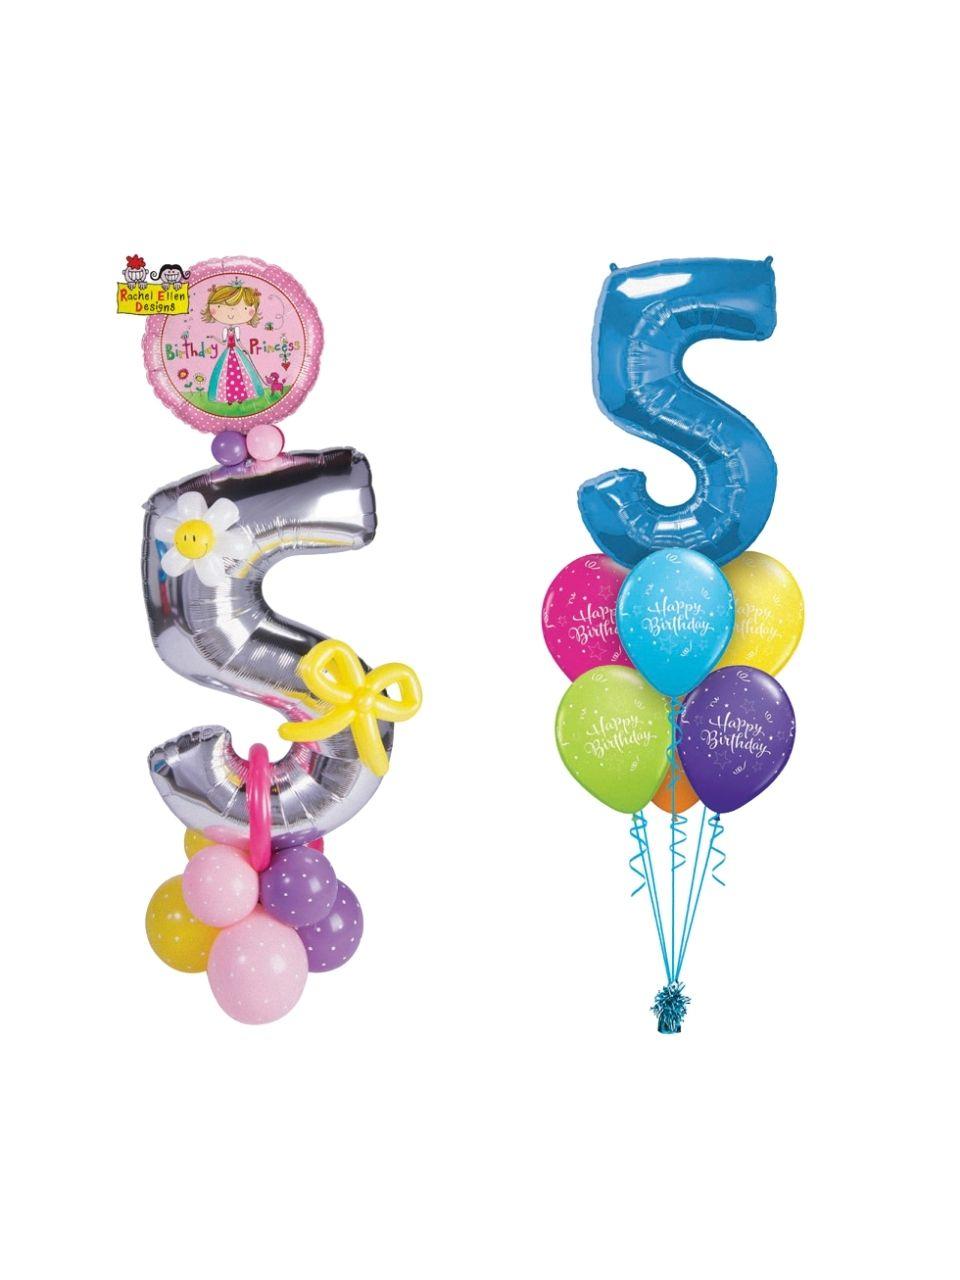 original design balloon ages